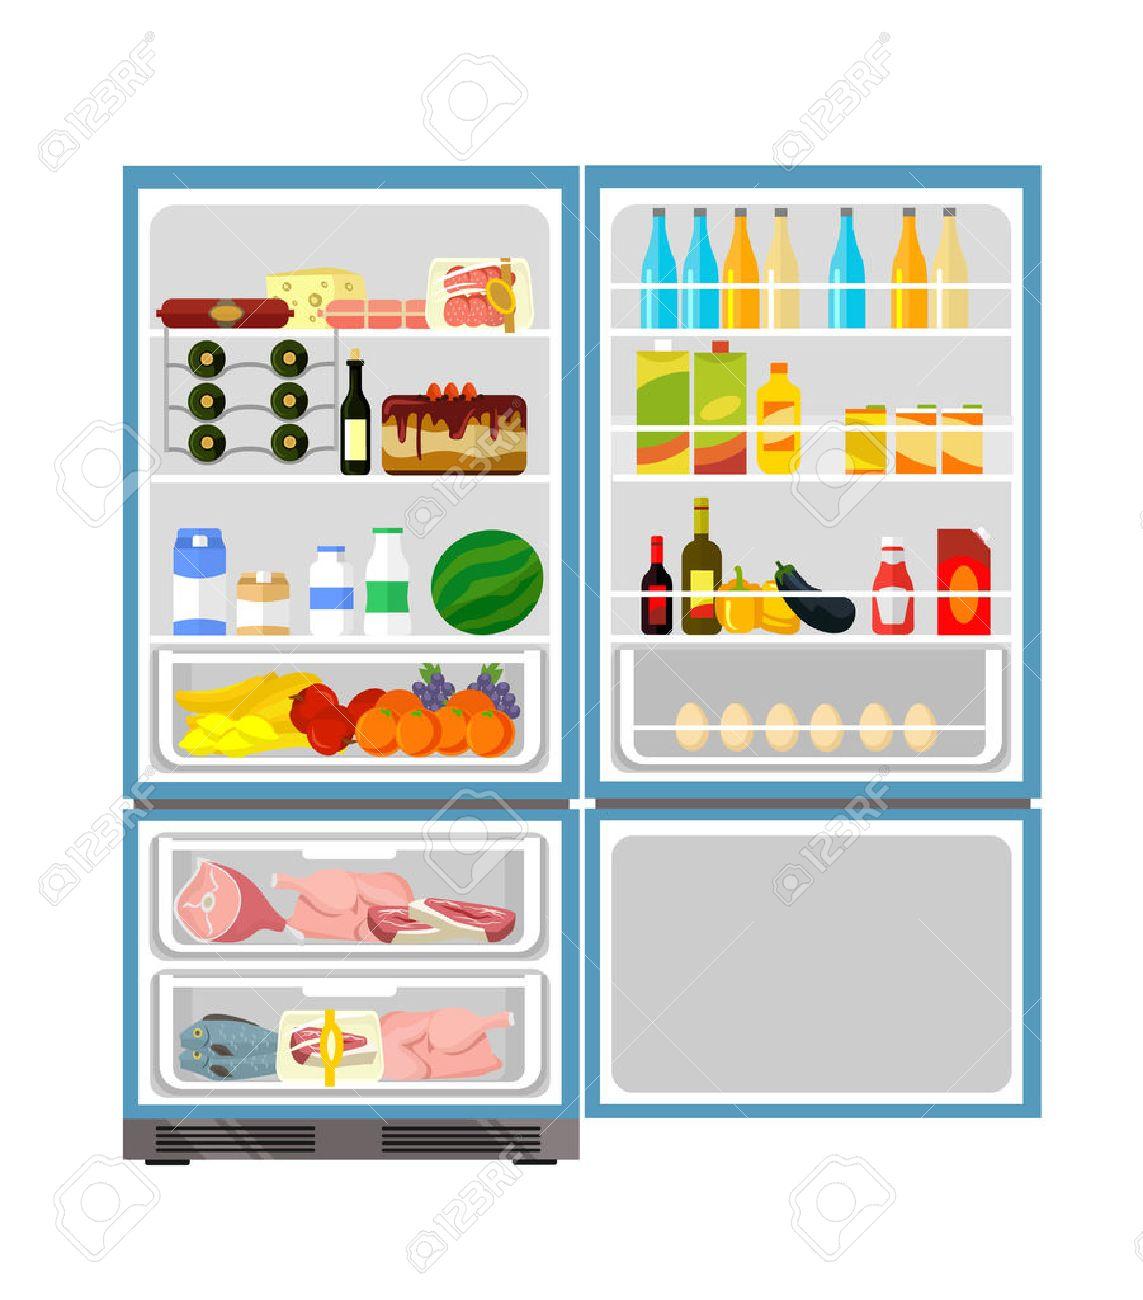 Fridge full of food. Vector flat illustration - 42775095